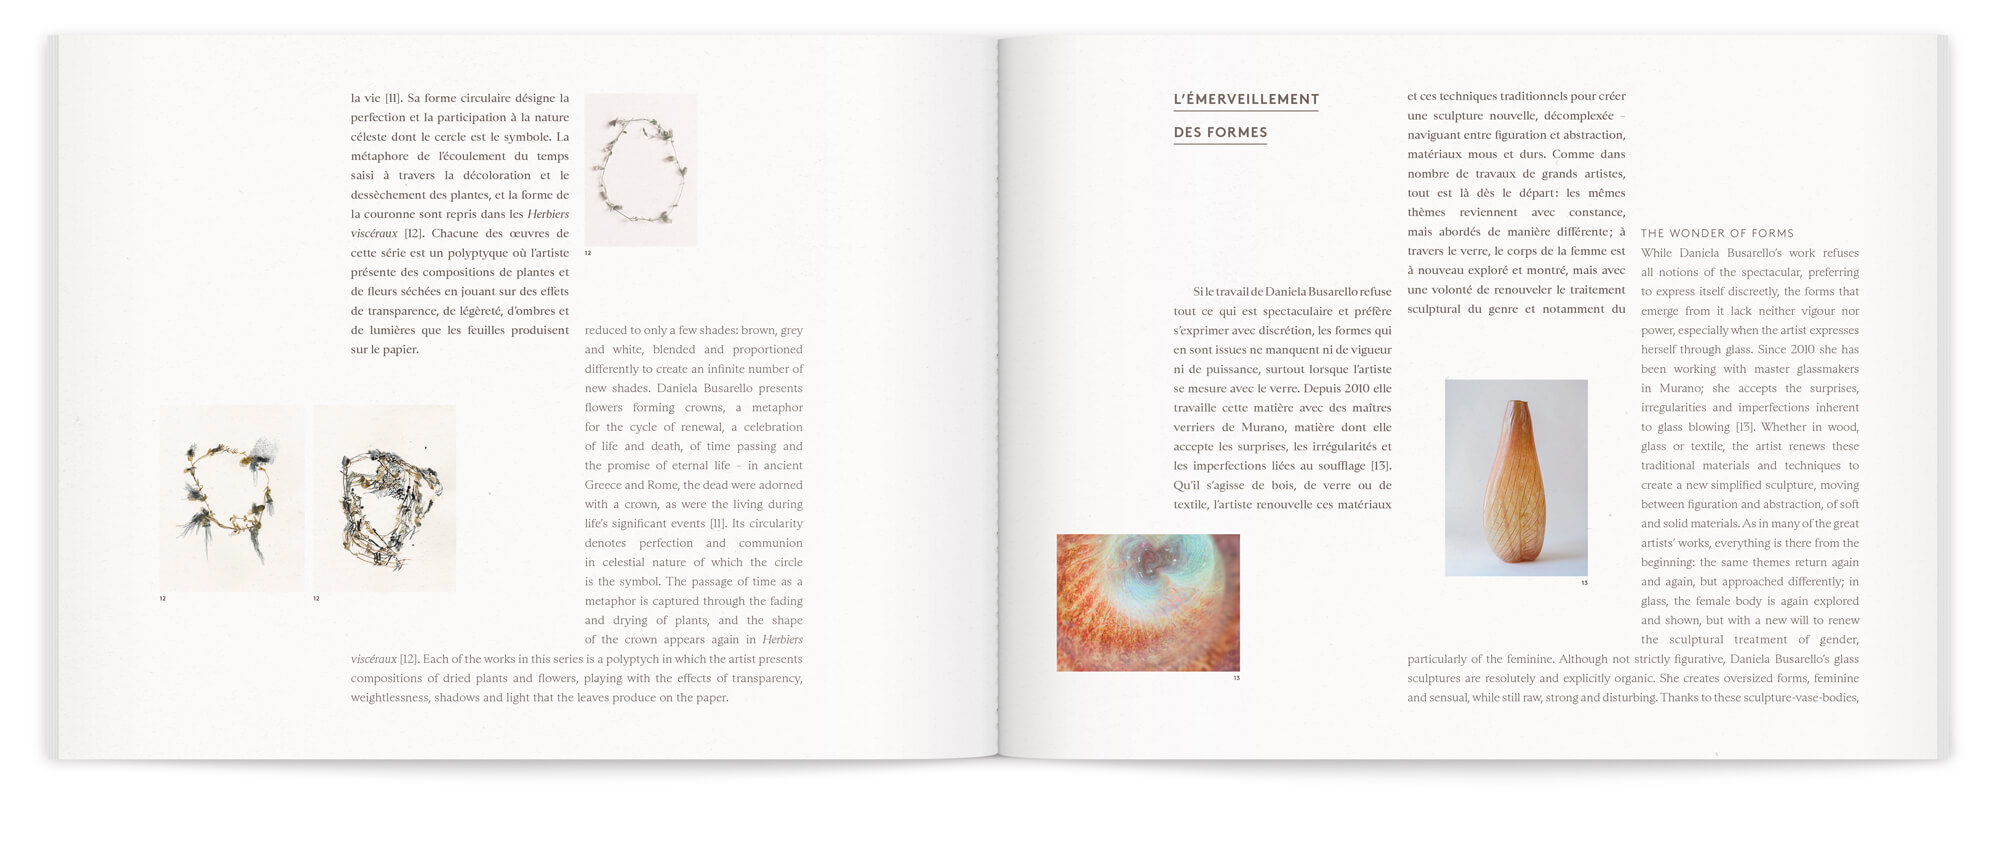 daniela-busarello-vida-livret-emerveillement-formes-ichetkar